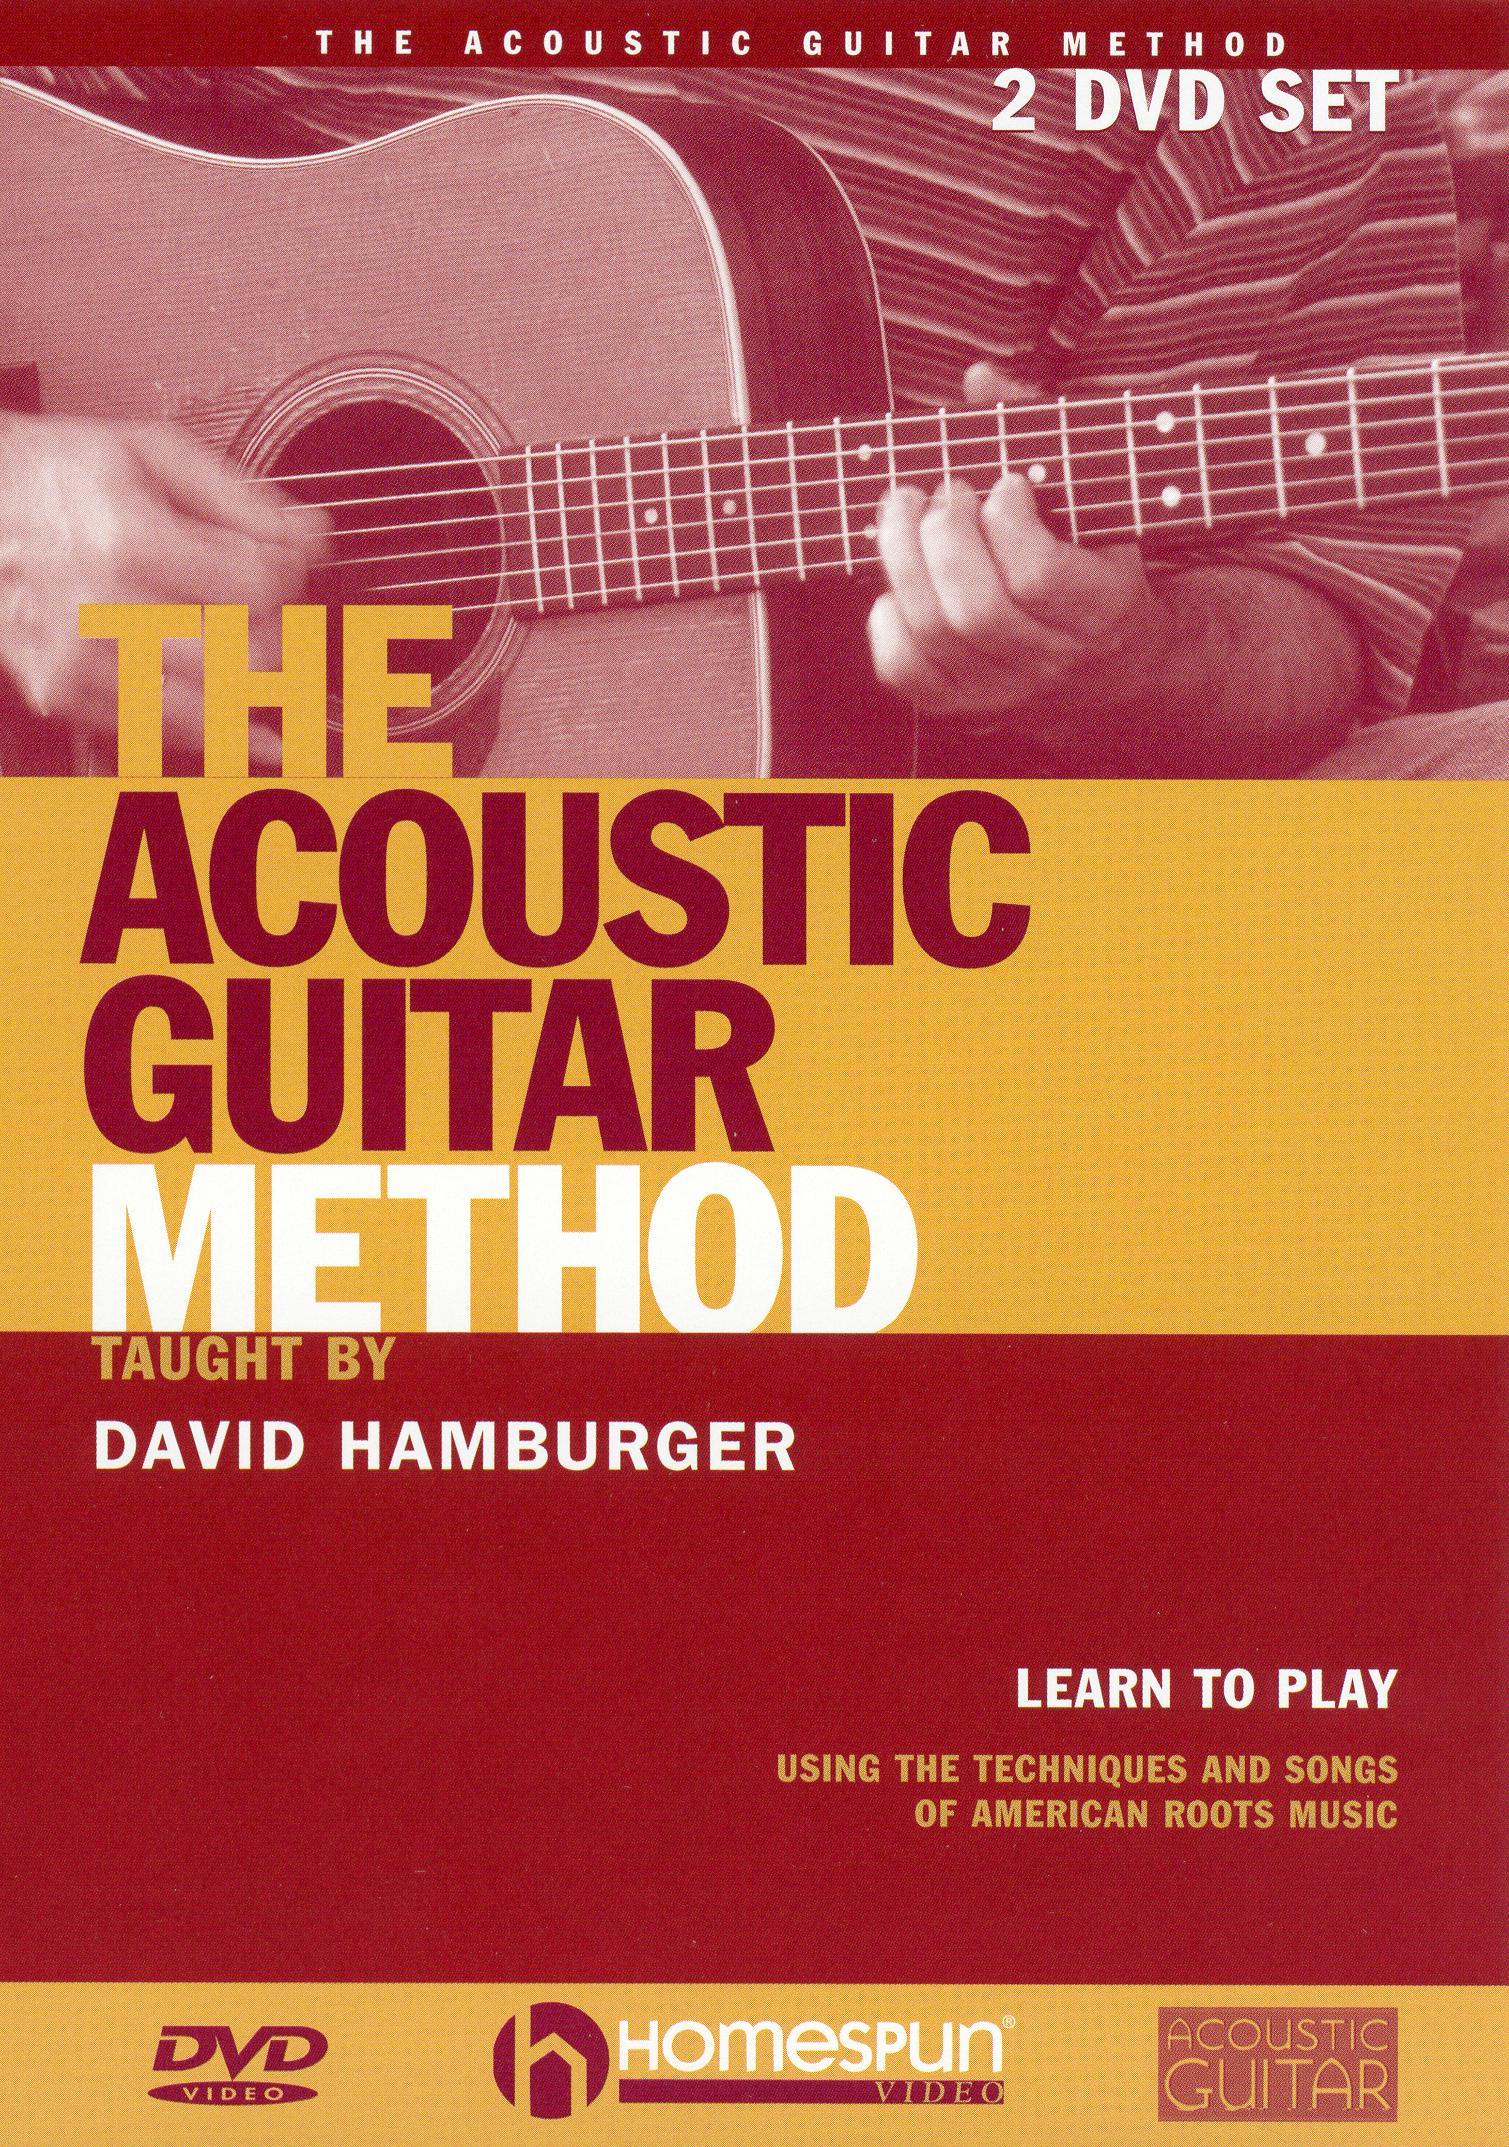 David Hamburger: The Acoustic Guitar Method